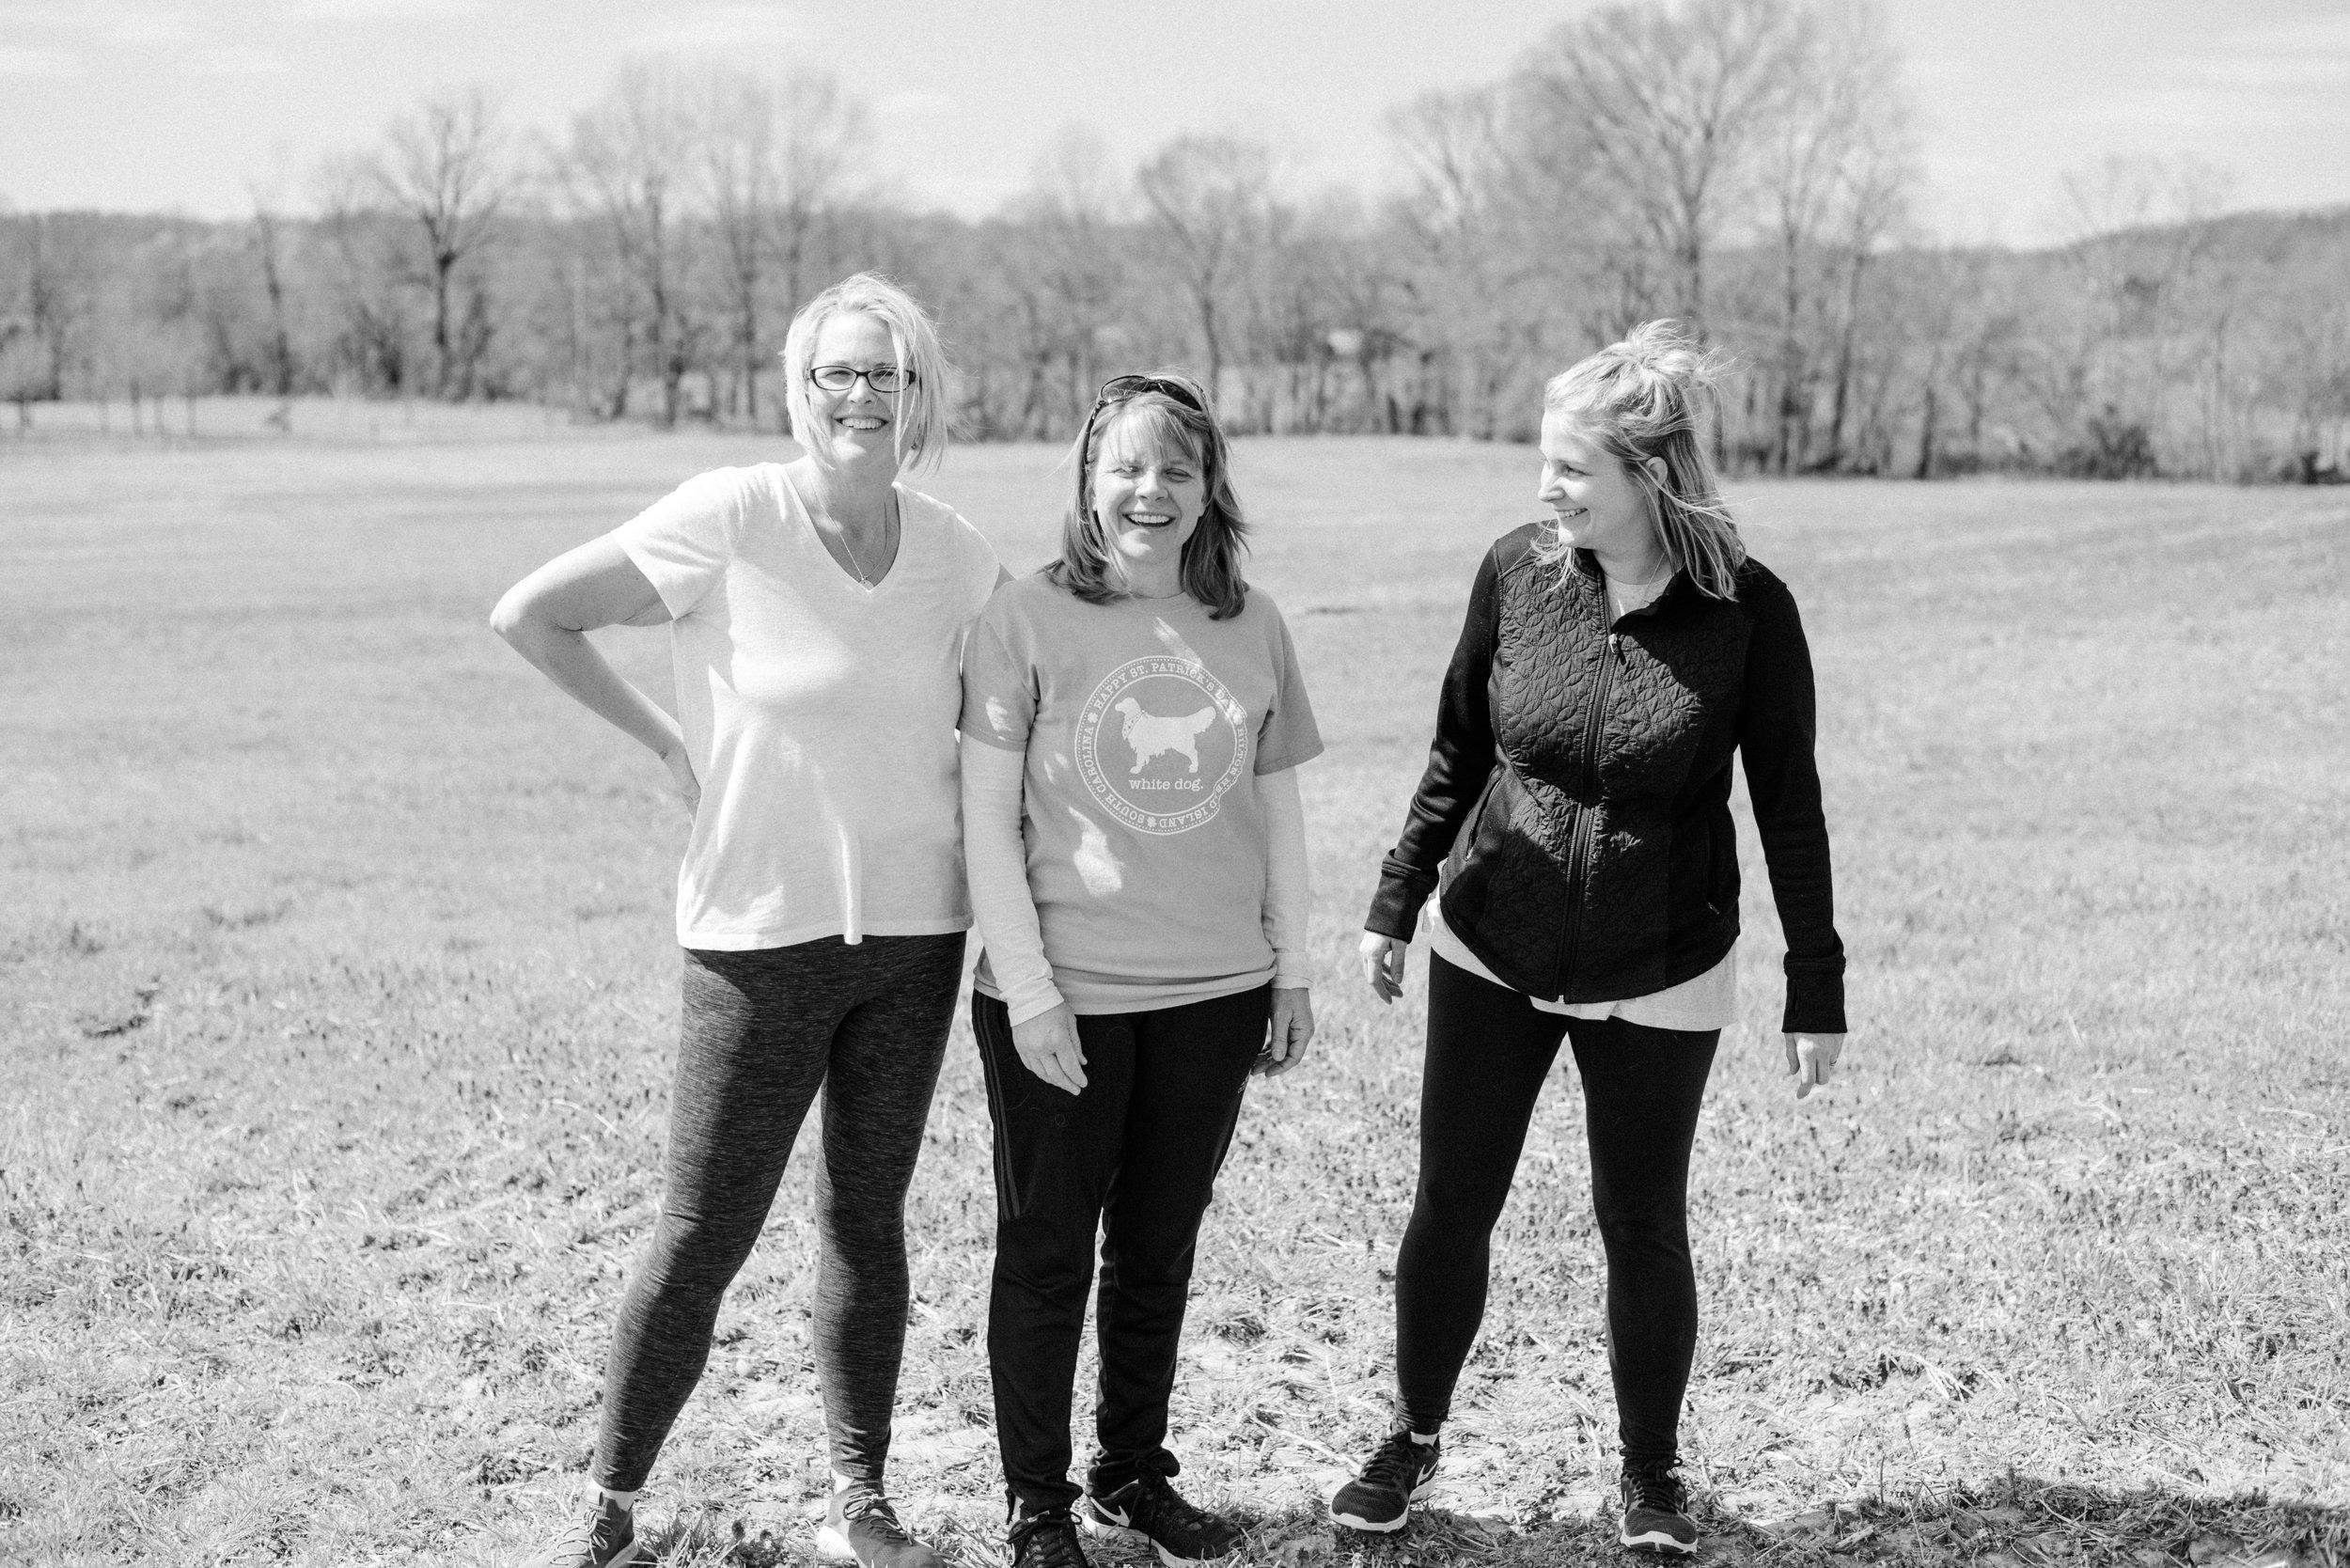 From left to right: Dori, Tara, and Kristin.